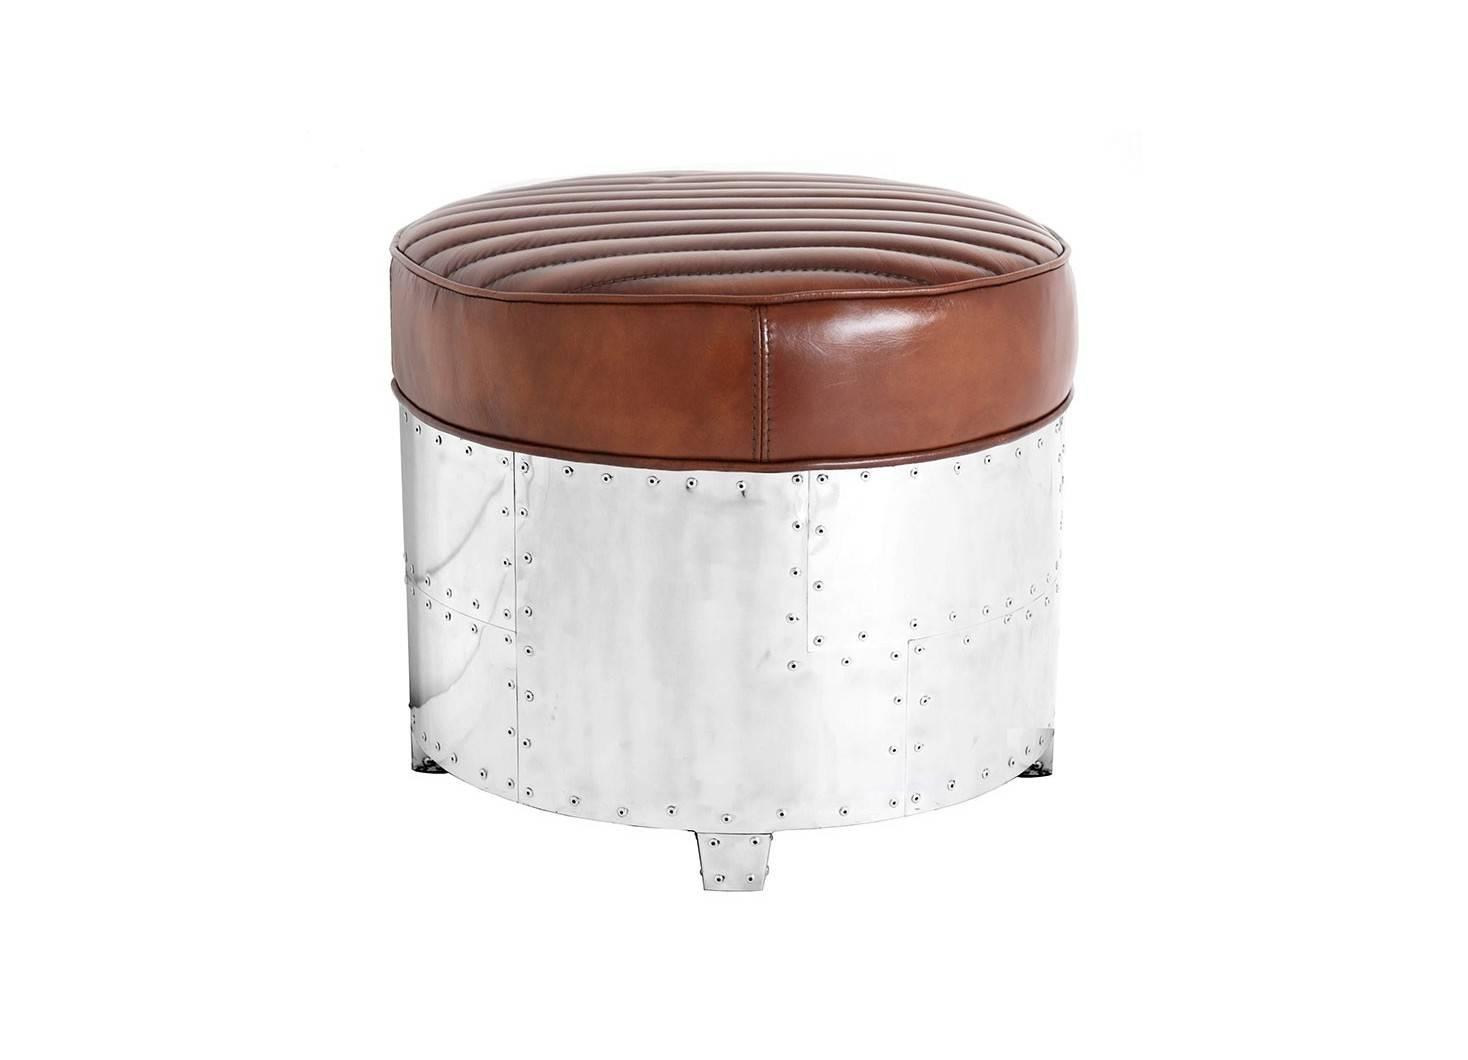 Aviator round Ottoman - Brown leather